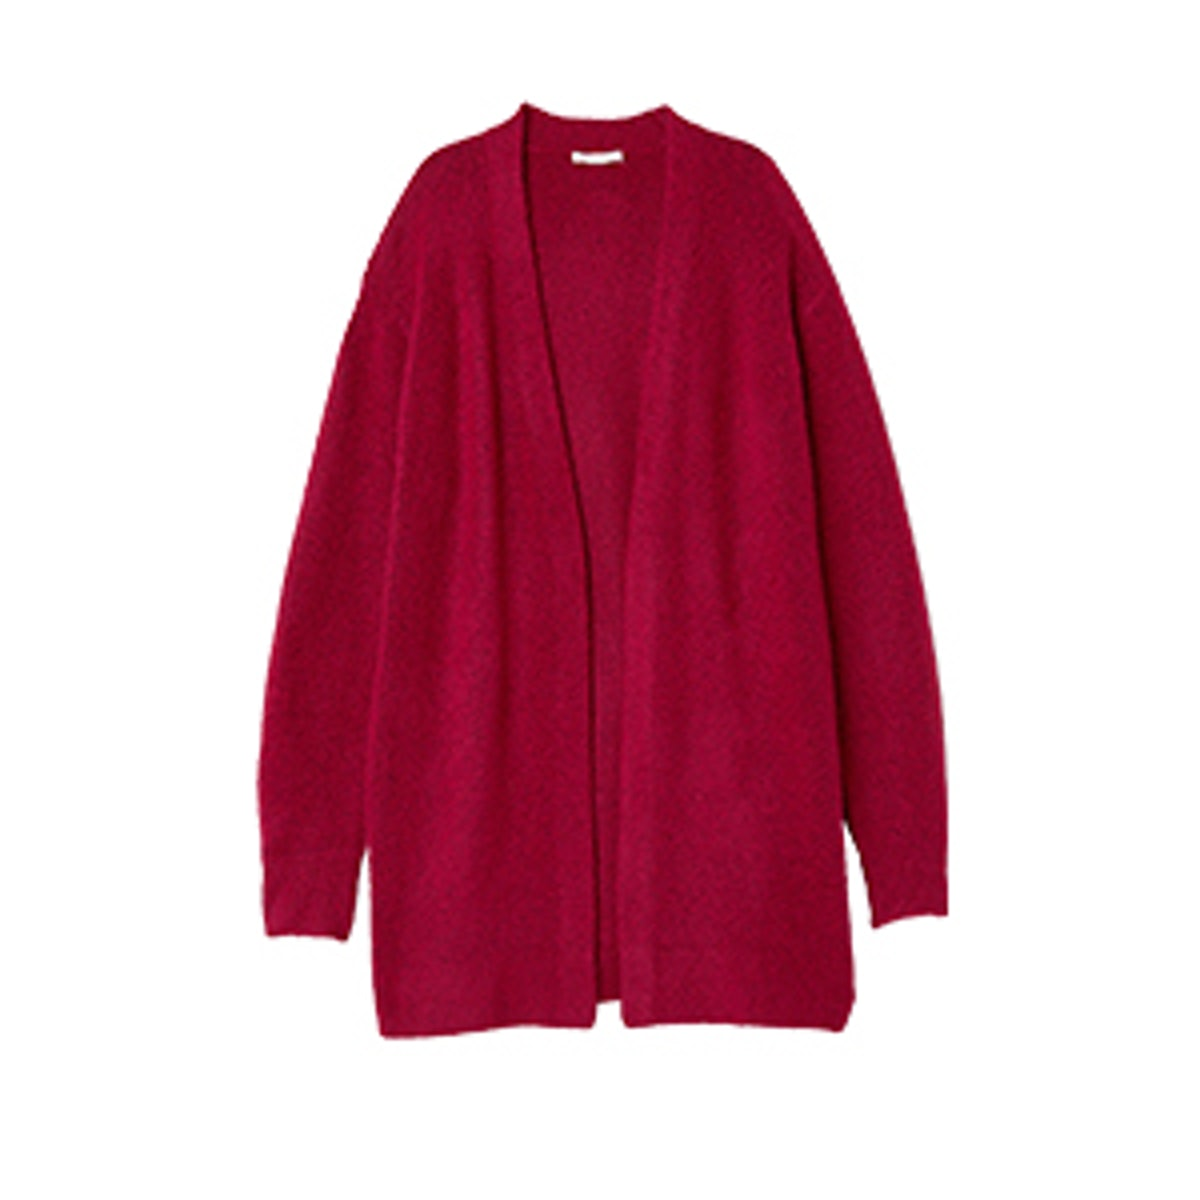 Knit Wool-blend Cardigan